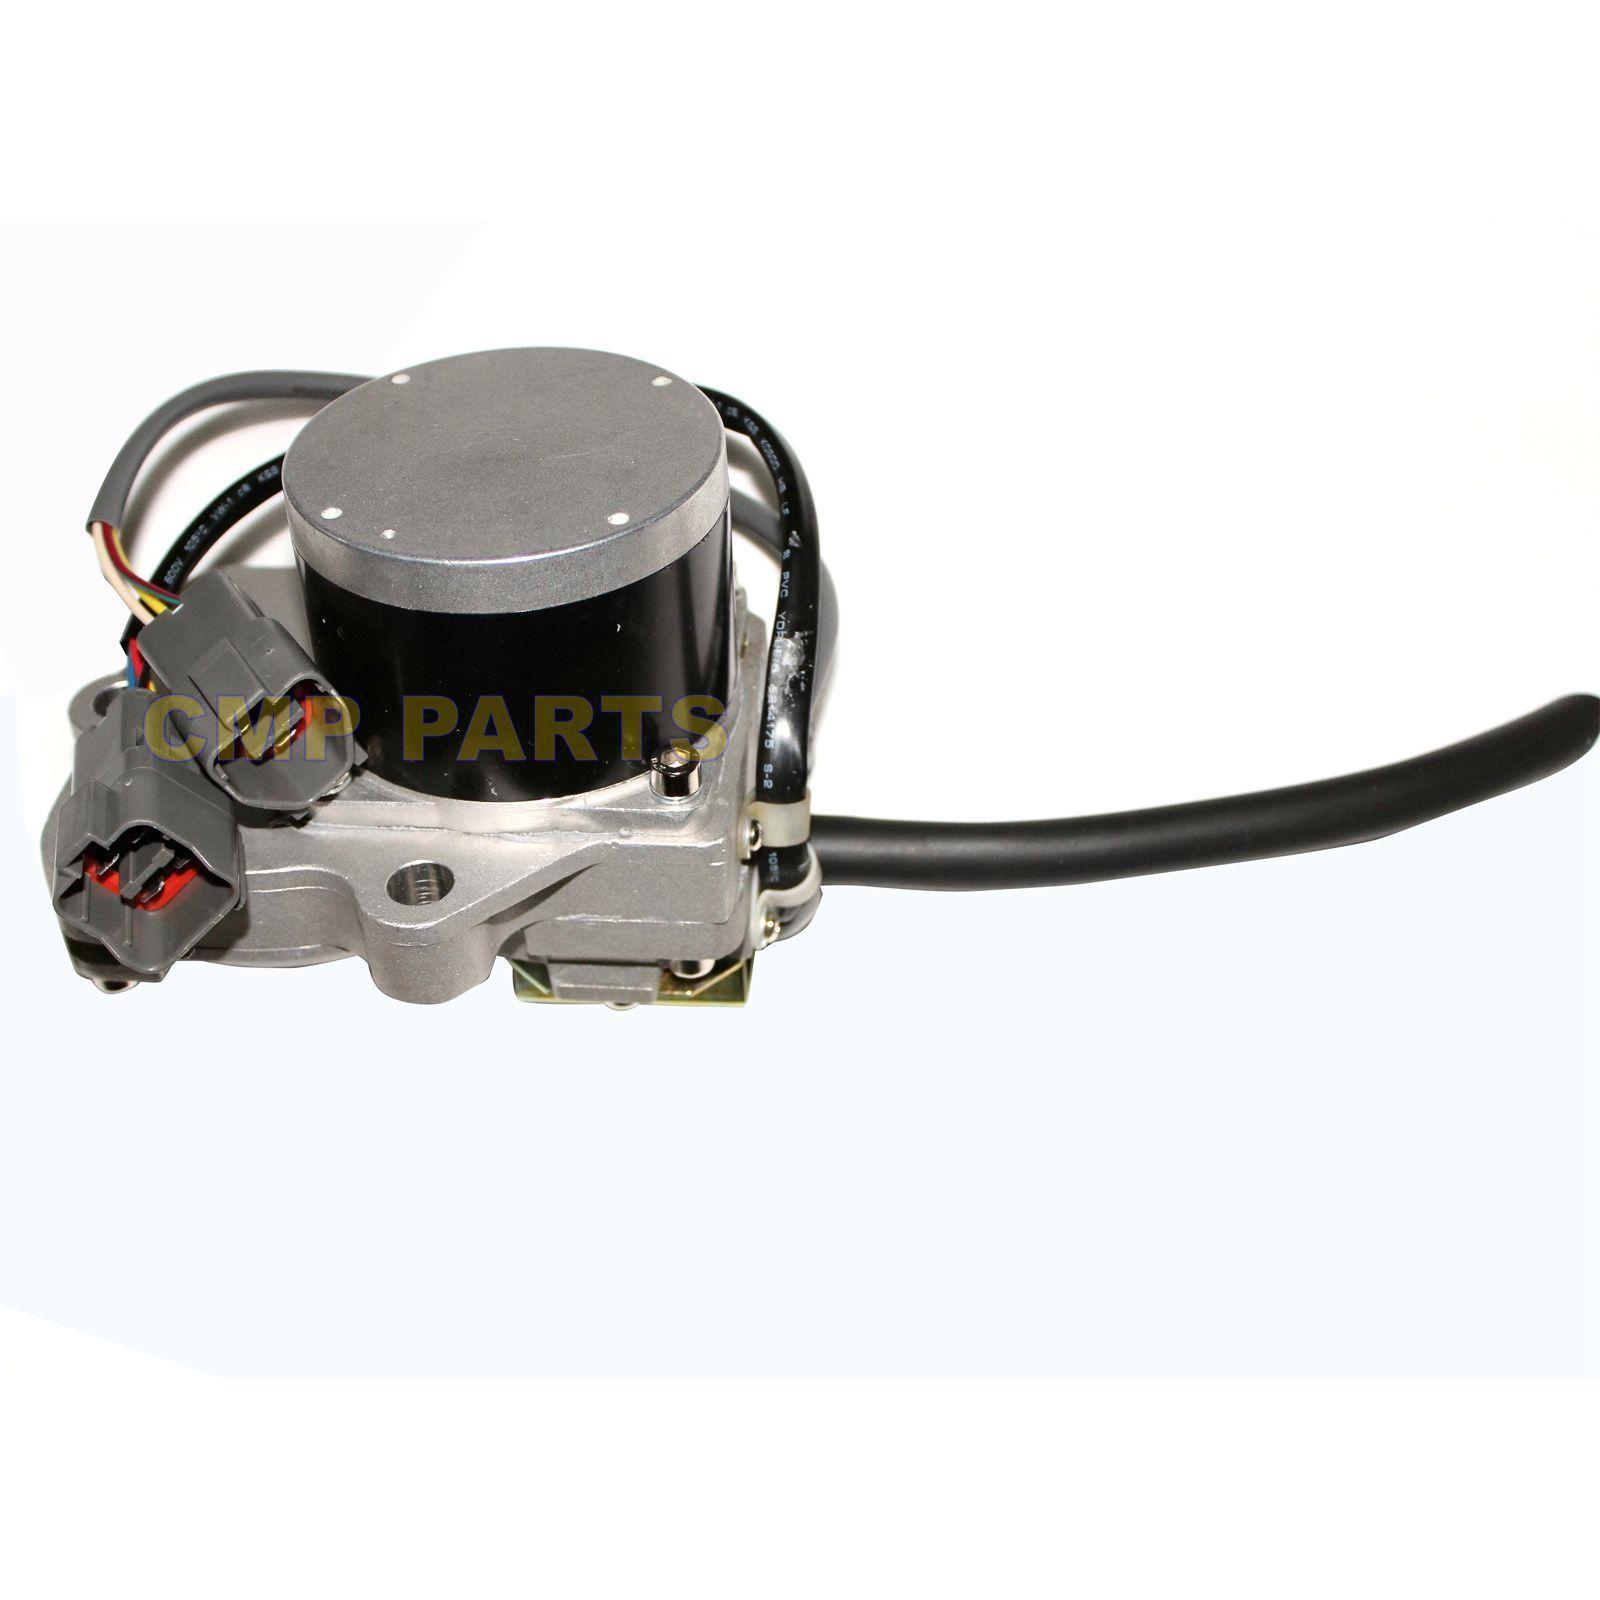 Throttle Motor 7834-40-3002 for Komatsu and similar items